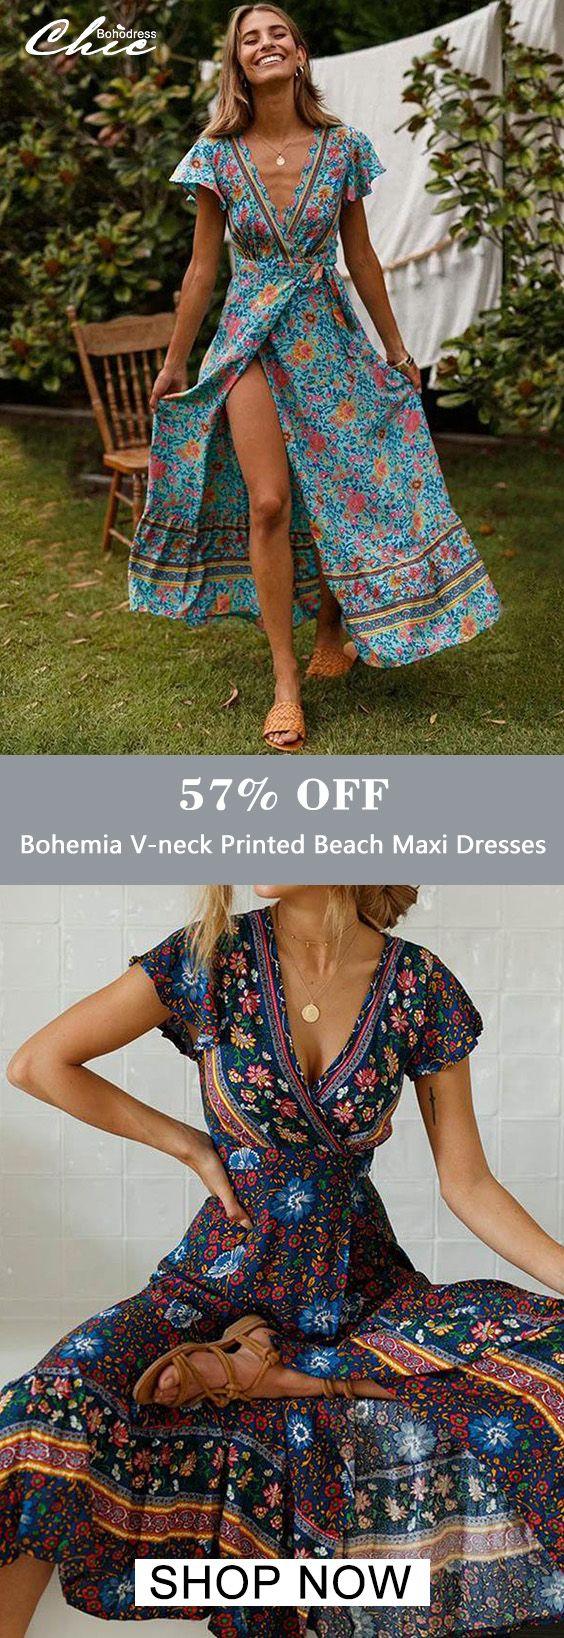 Photo of Bohemia V-neck Printed Beach Maxi Dresses